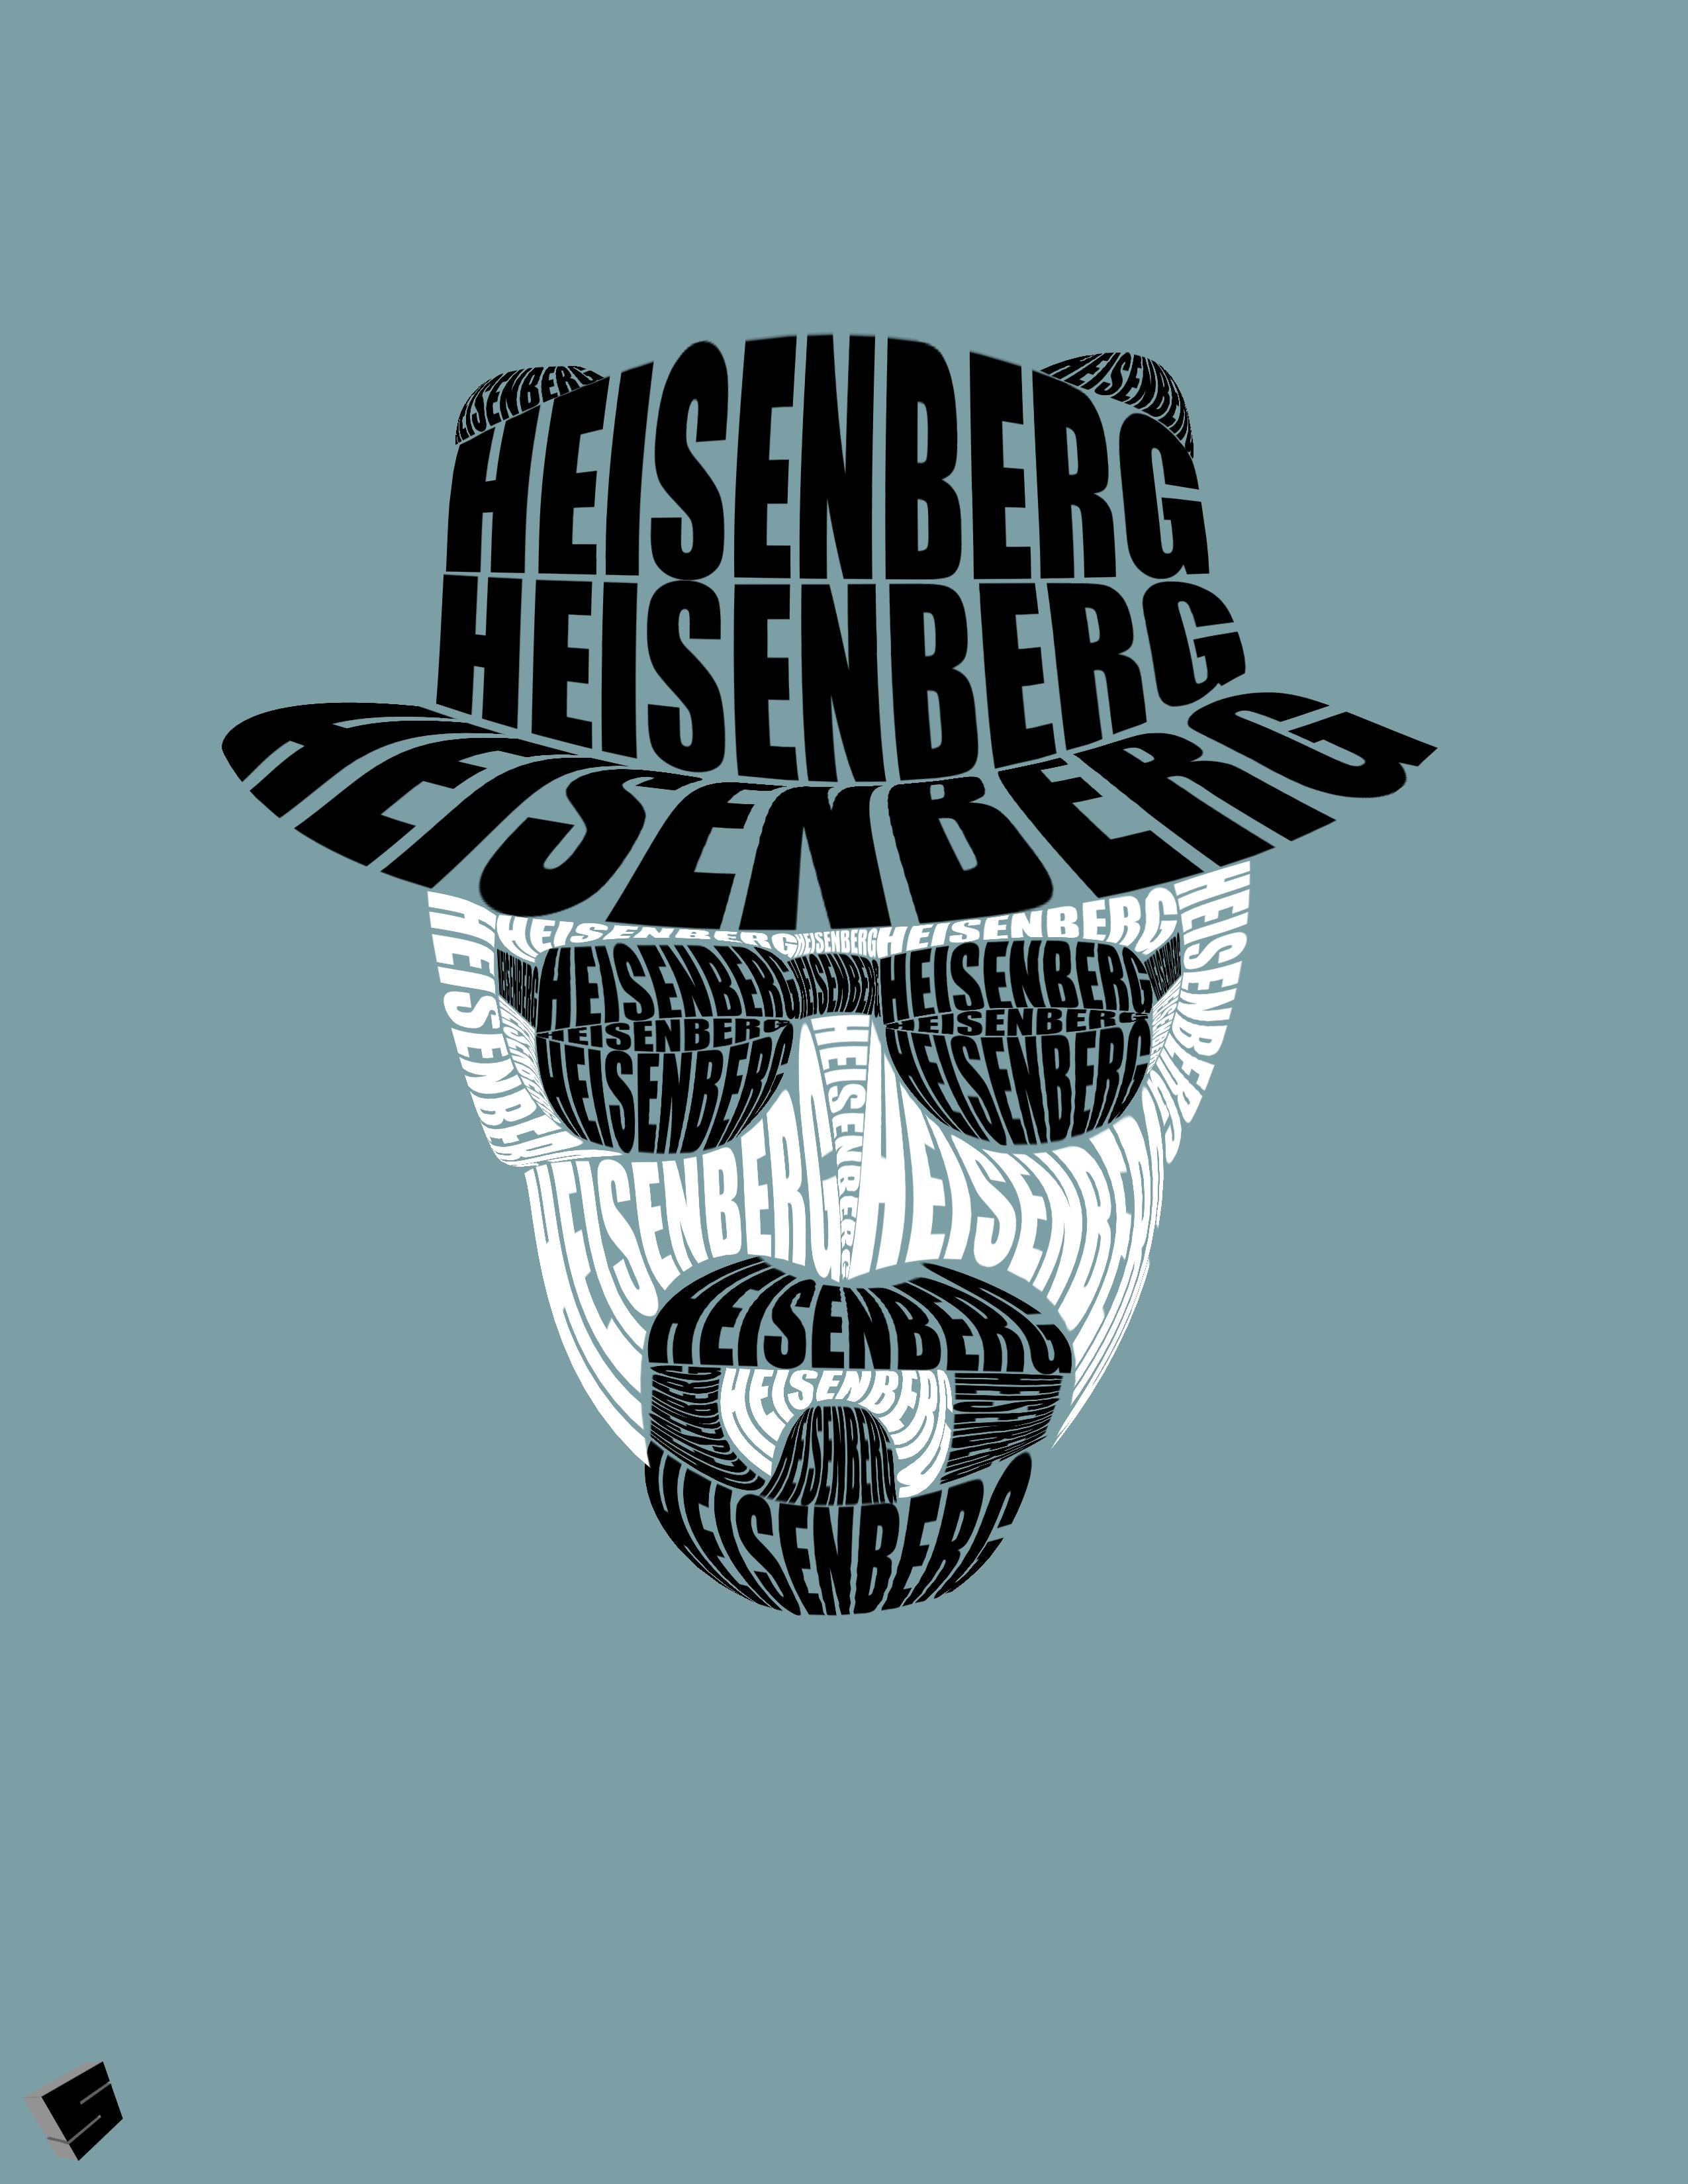 Dr Werner Heisenberg Breaking Bad Art Typography Poster Bad Art